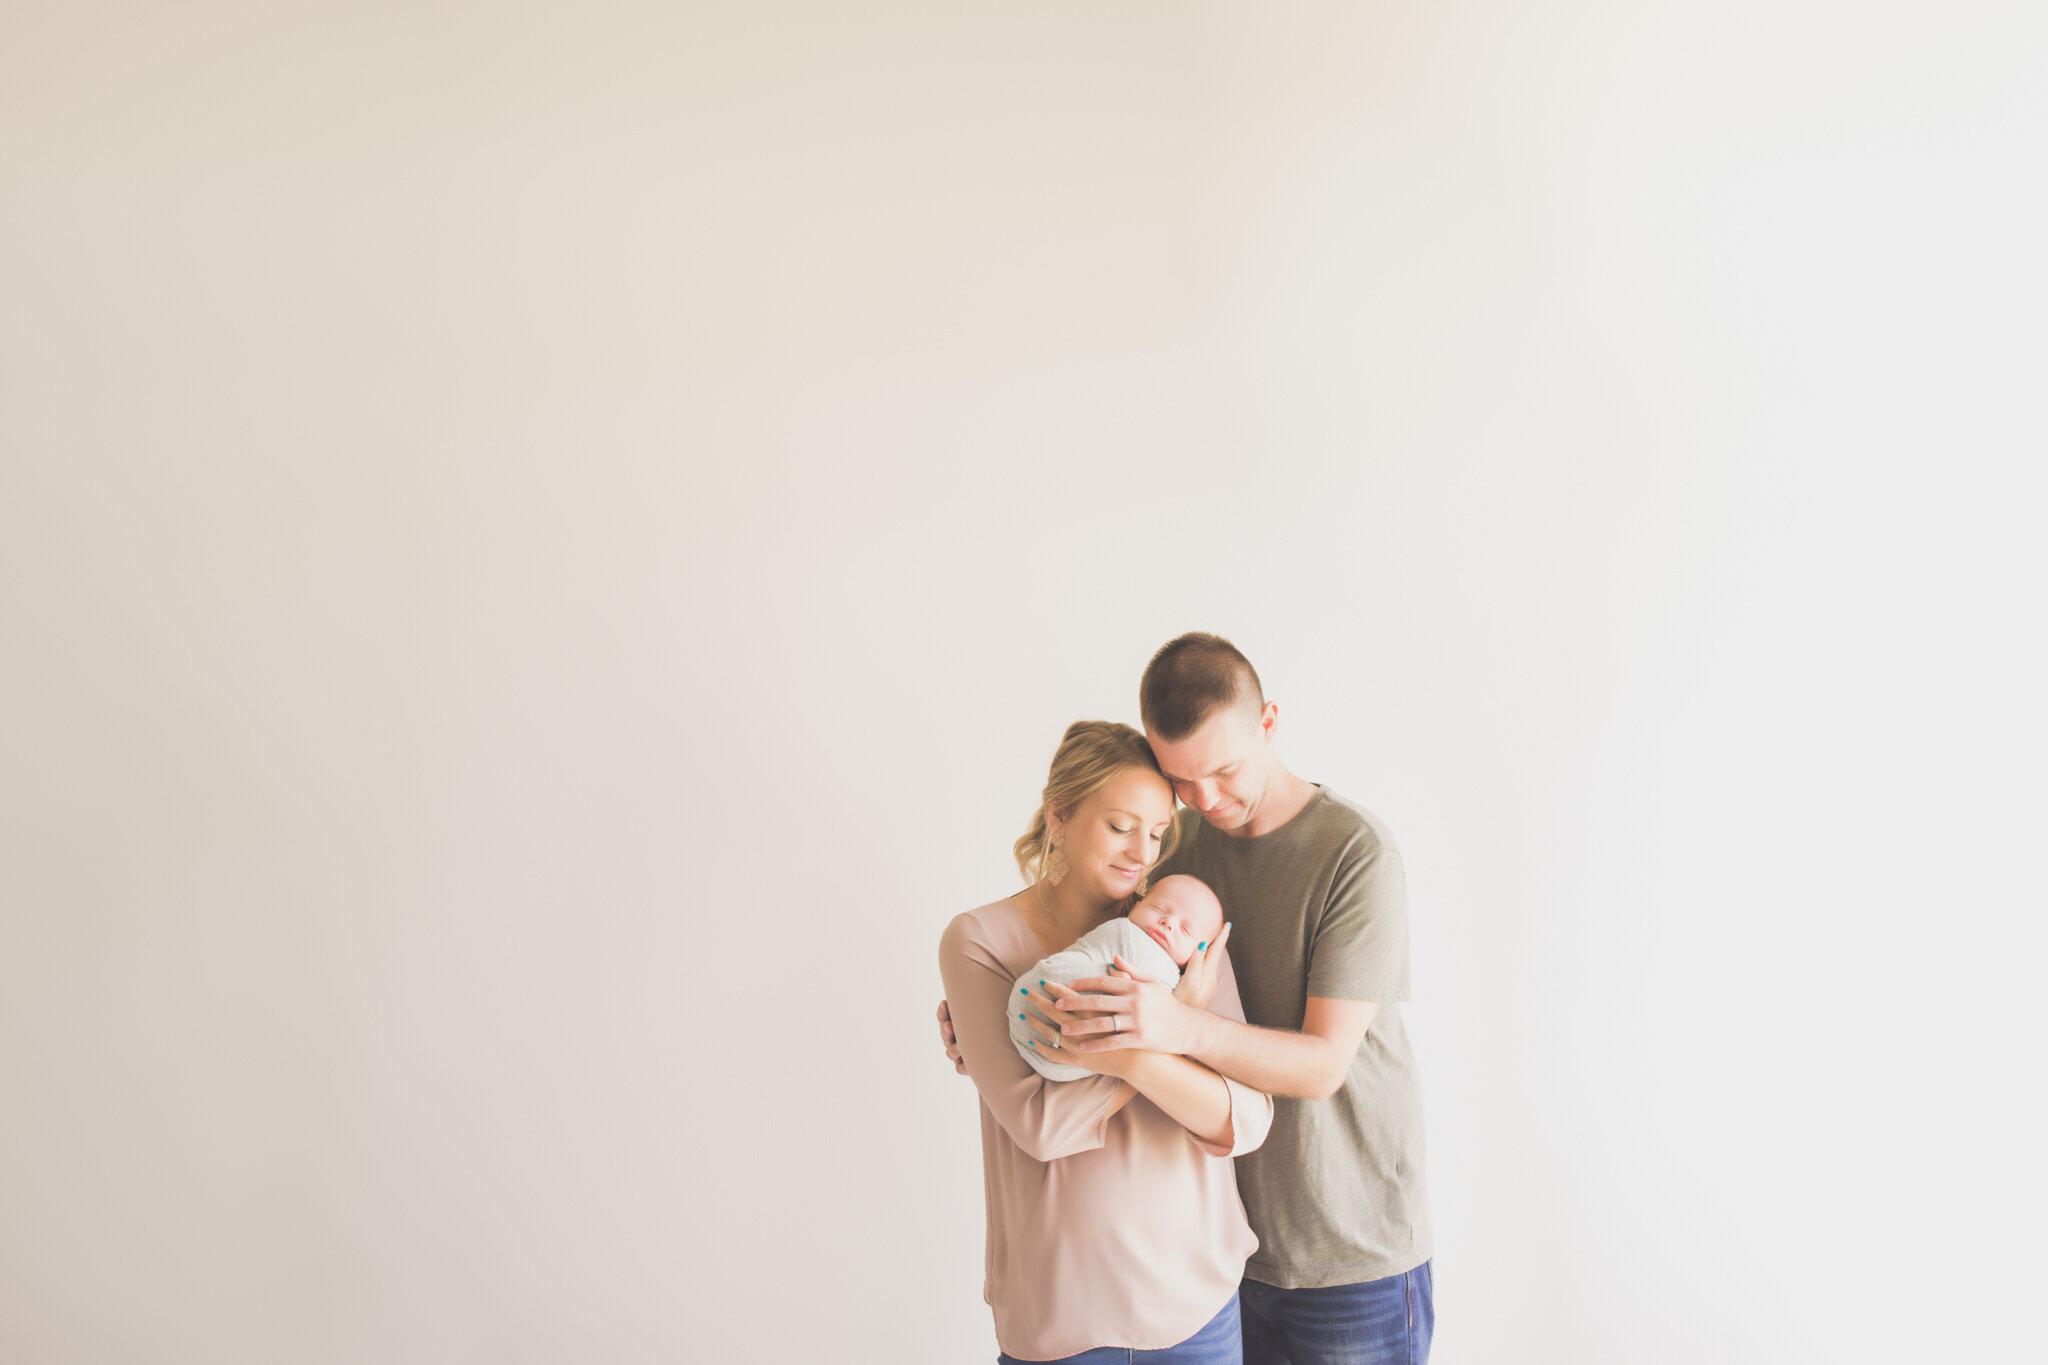 Case Newborn Session Studio Rockford IL  - Cara Peterson Photography 2019  -6.jpg